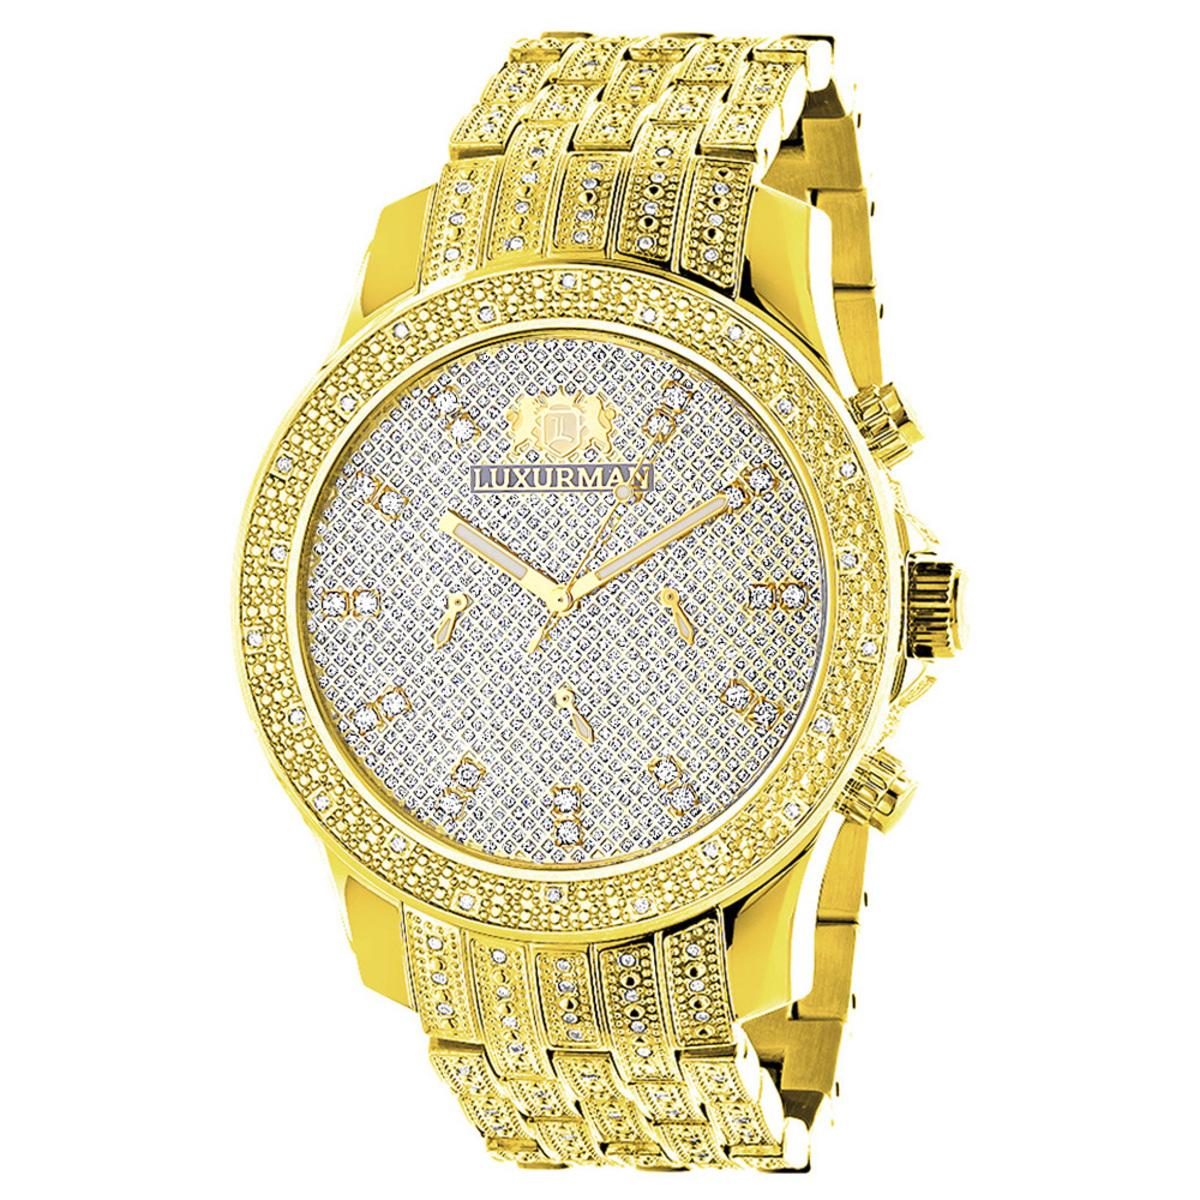 Luxurman Mens Diamond Watch Yellow Gold Tone 1ct